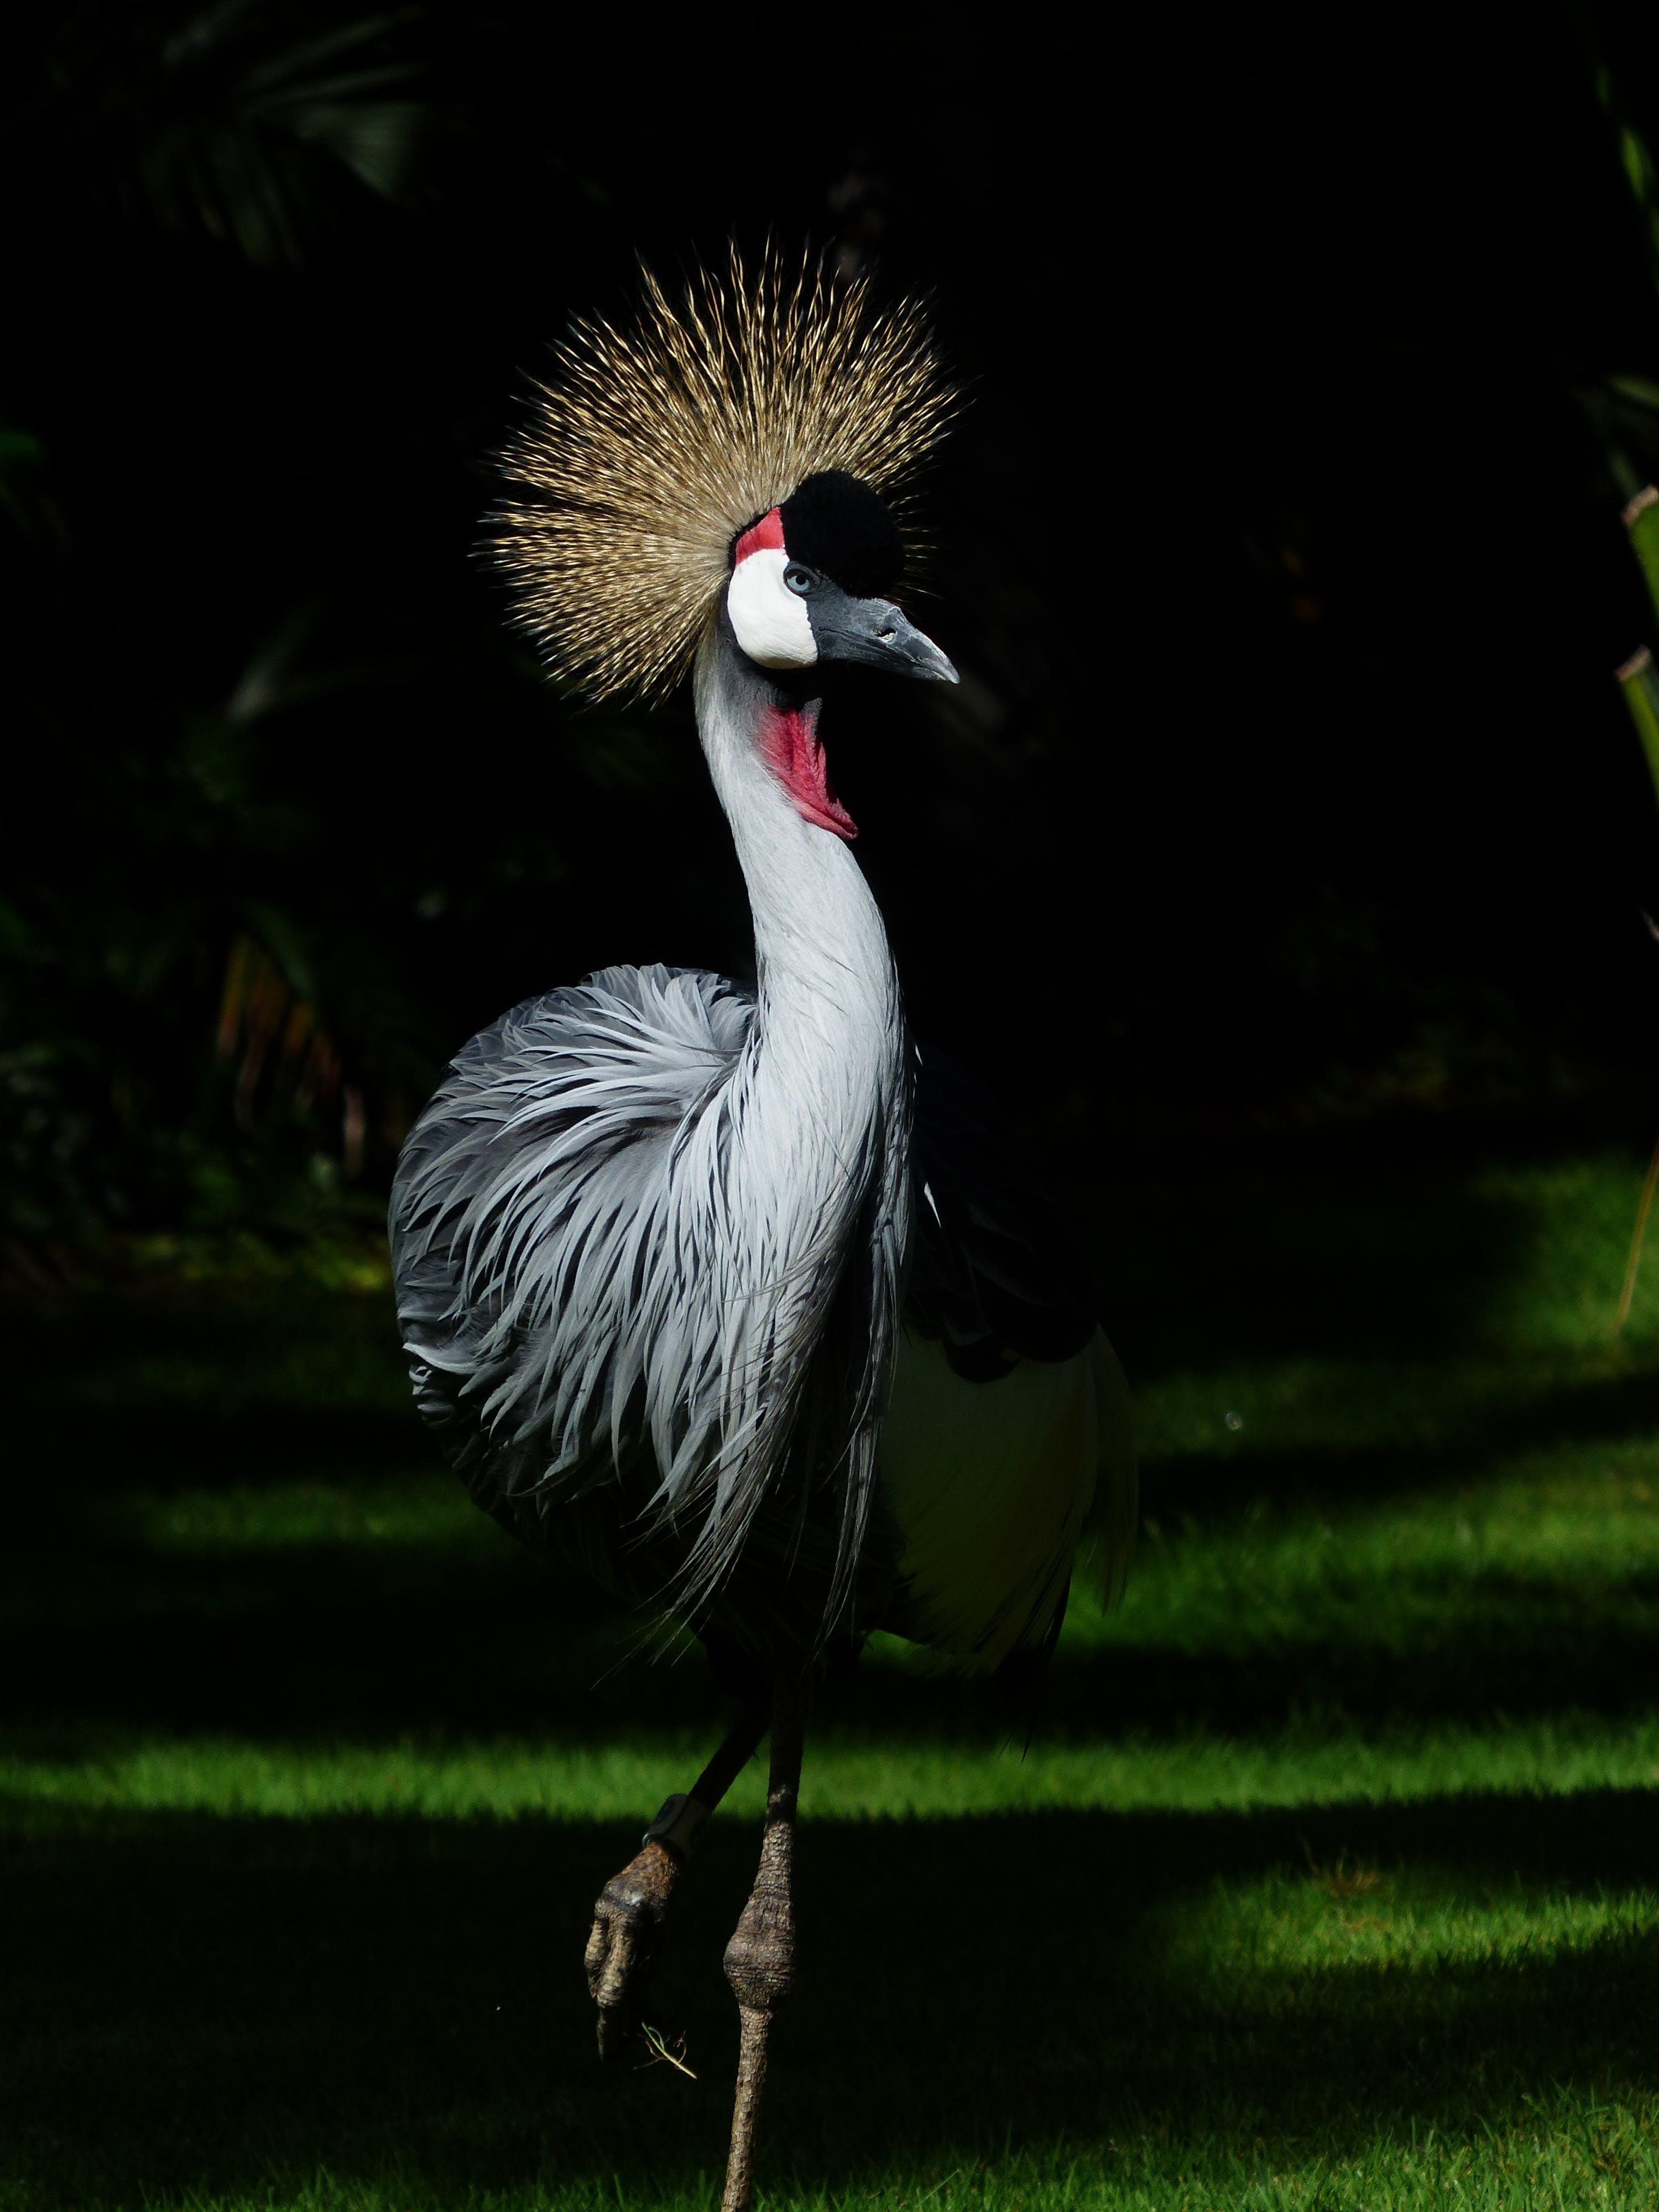 Free stock photo of bird, animal, grass, park